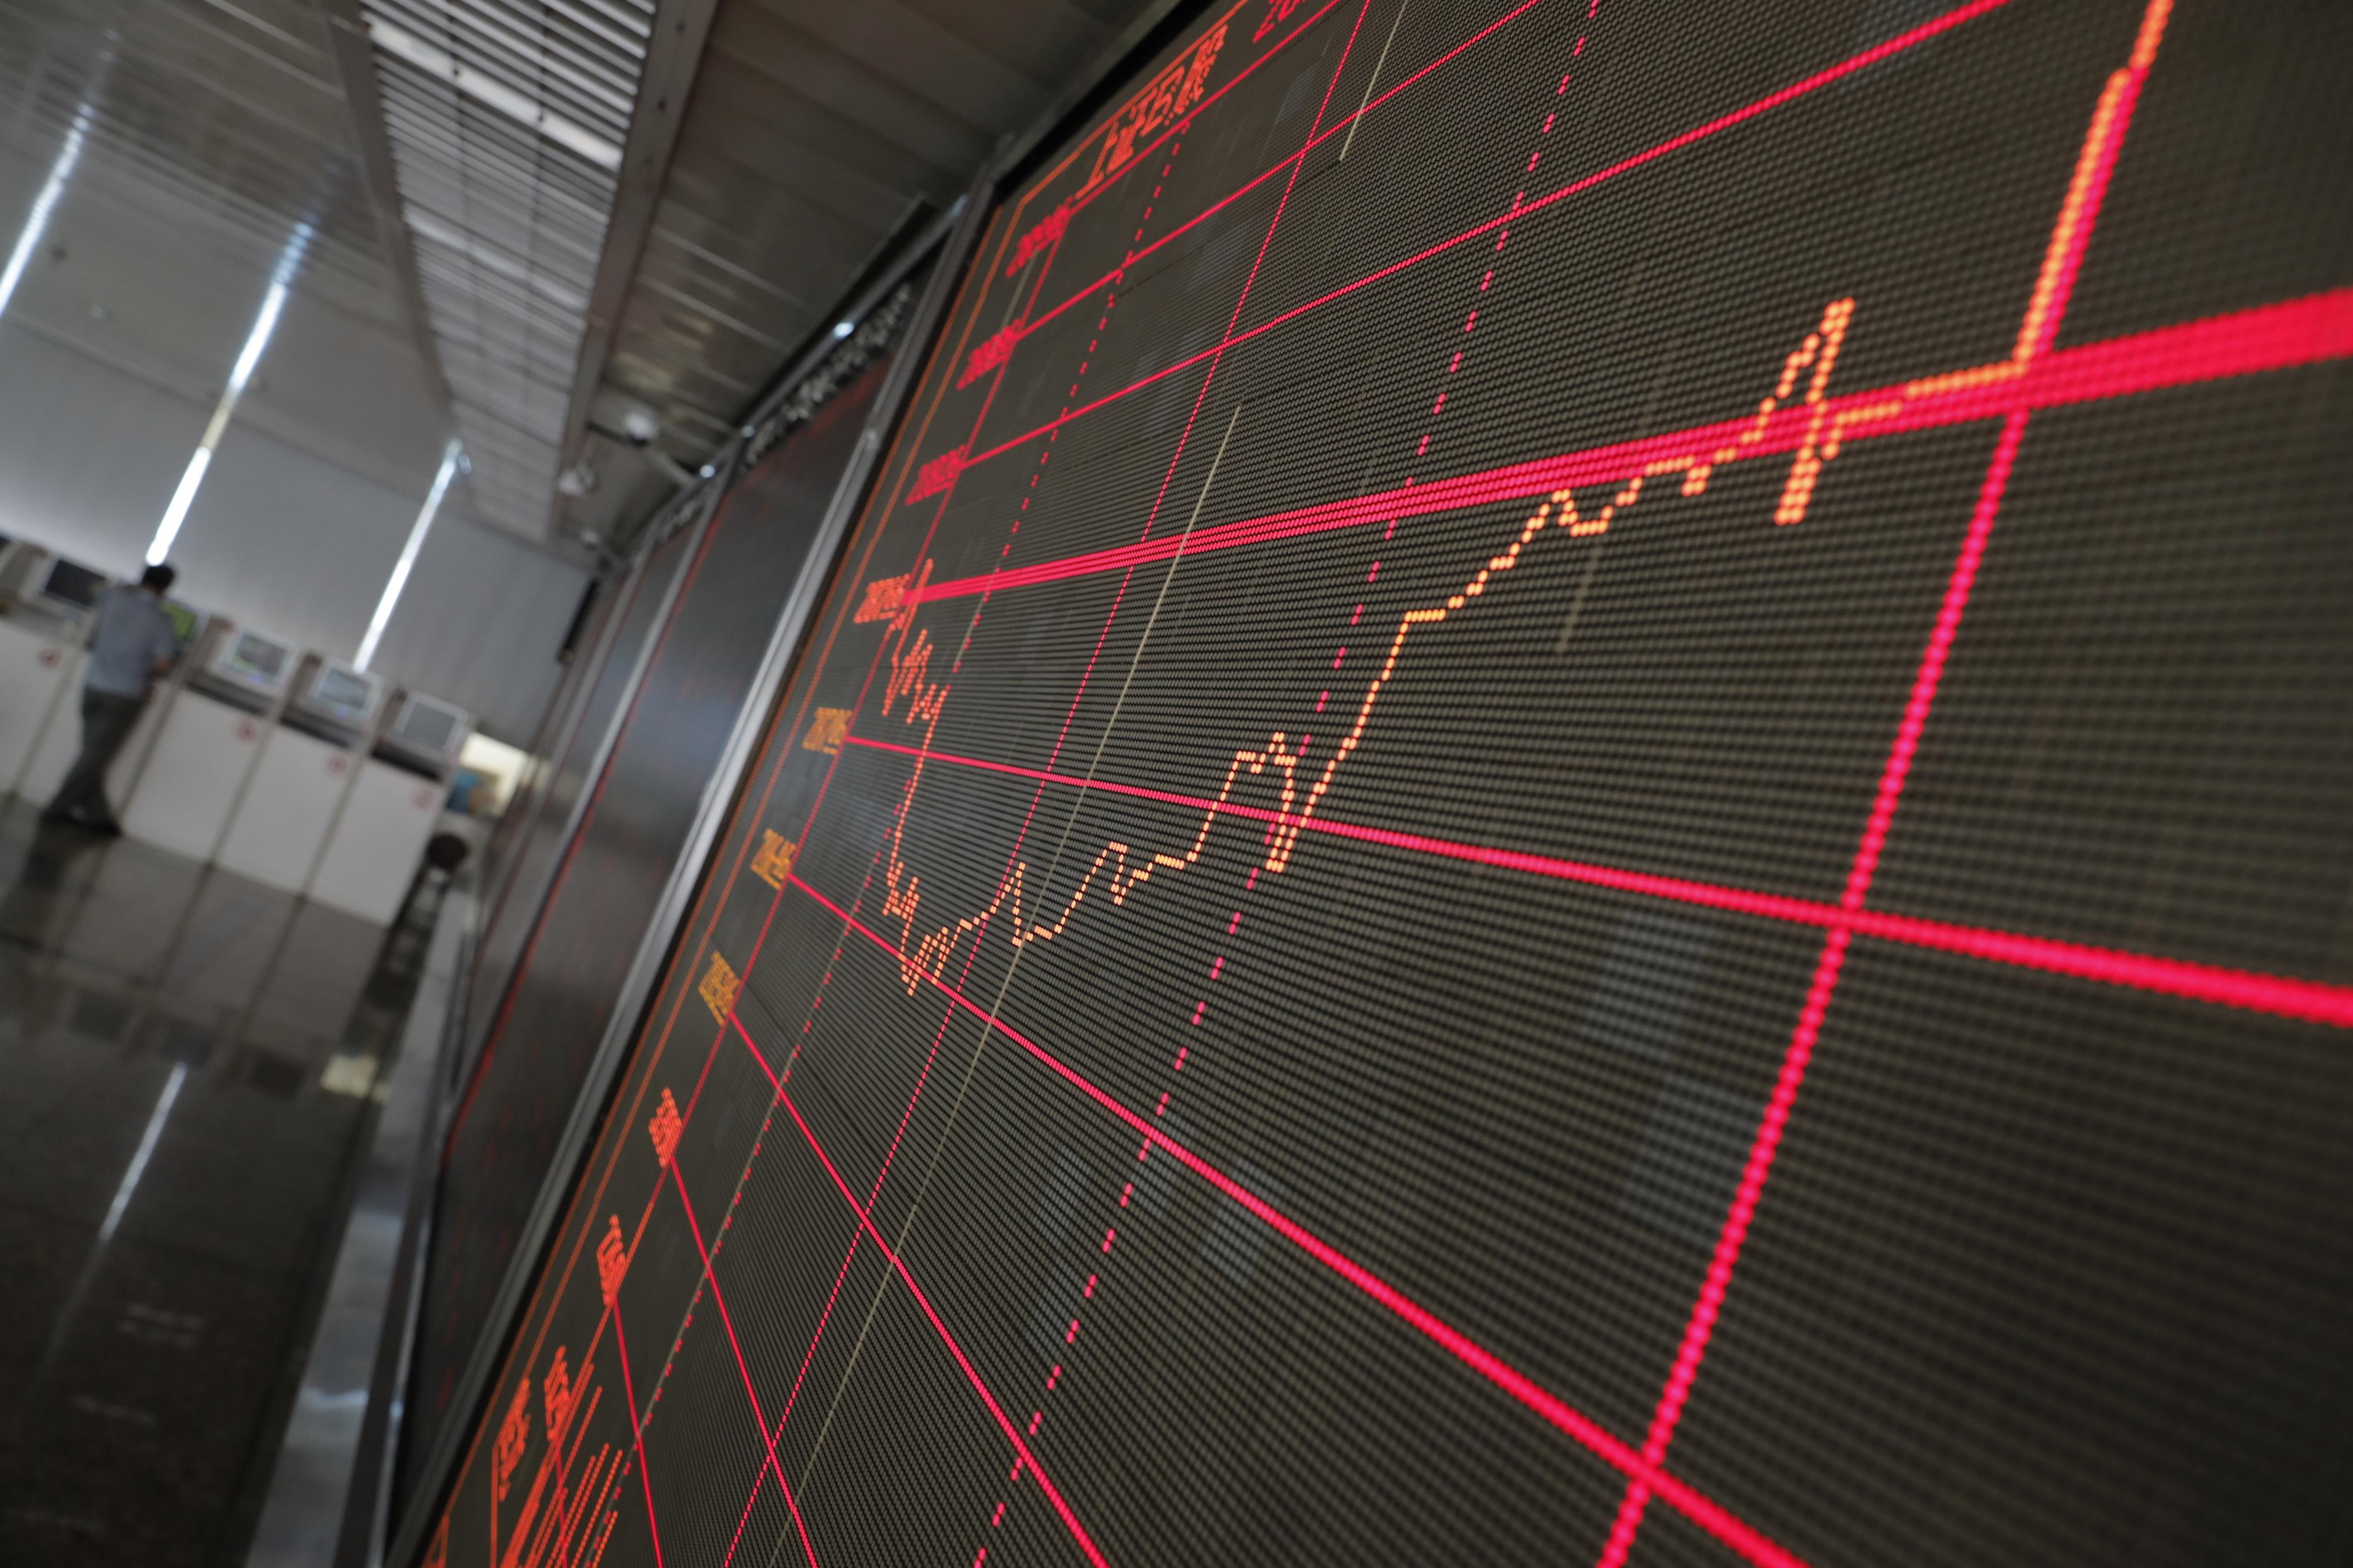 Bolsa de Xangai abriu a cair 0,29%